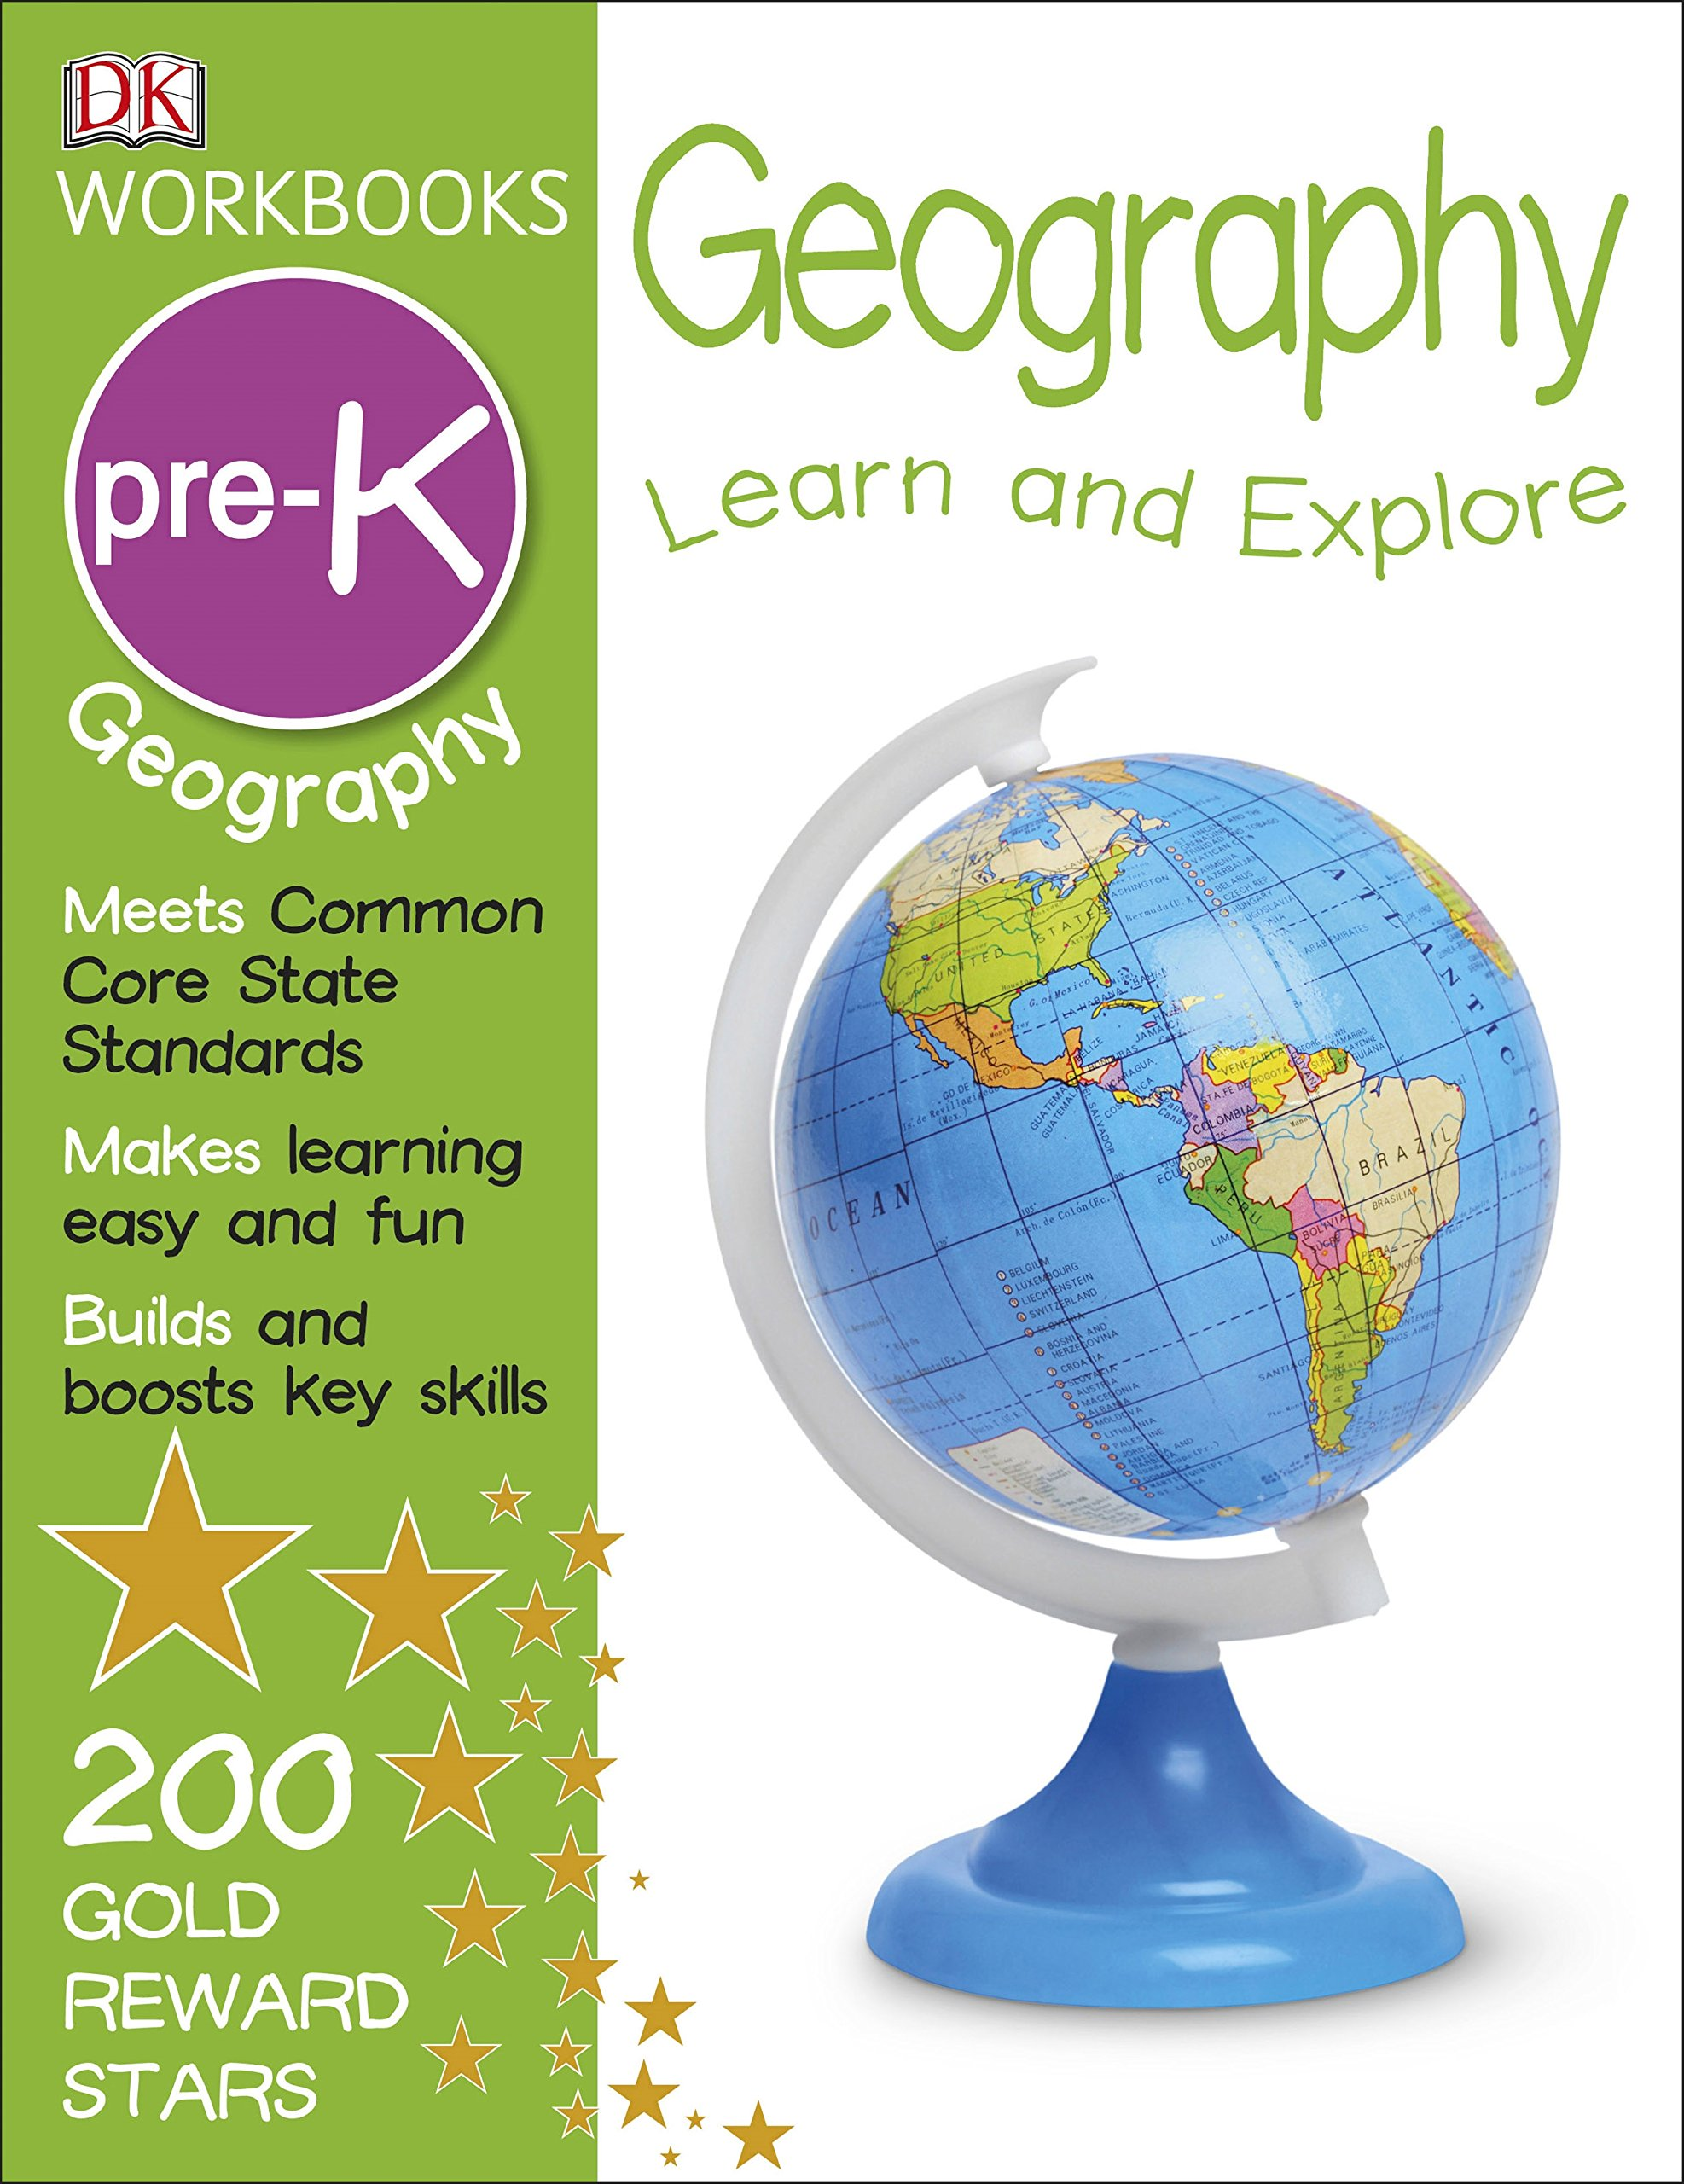 DK Workbooks Geography Pre K